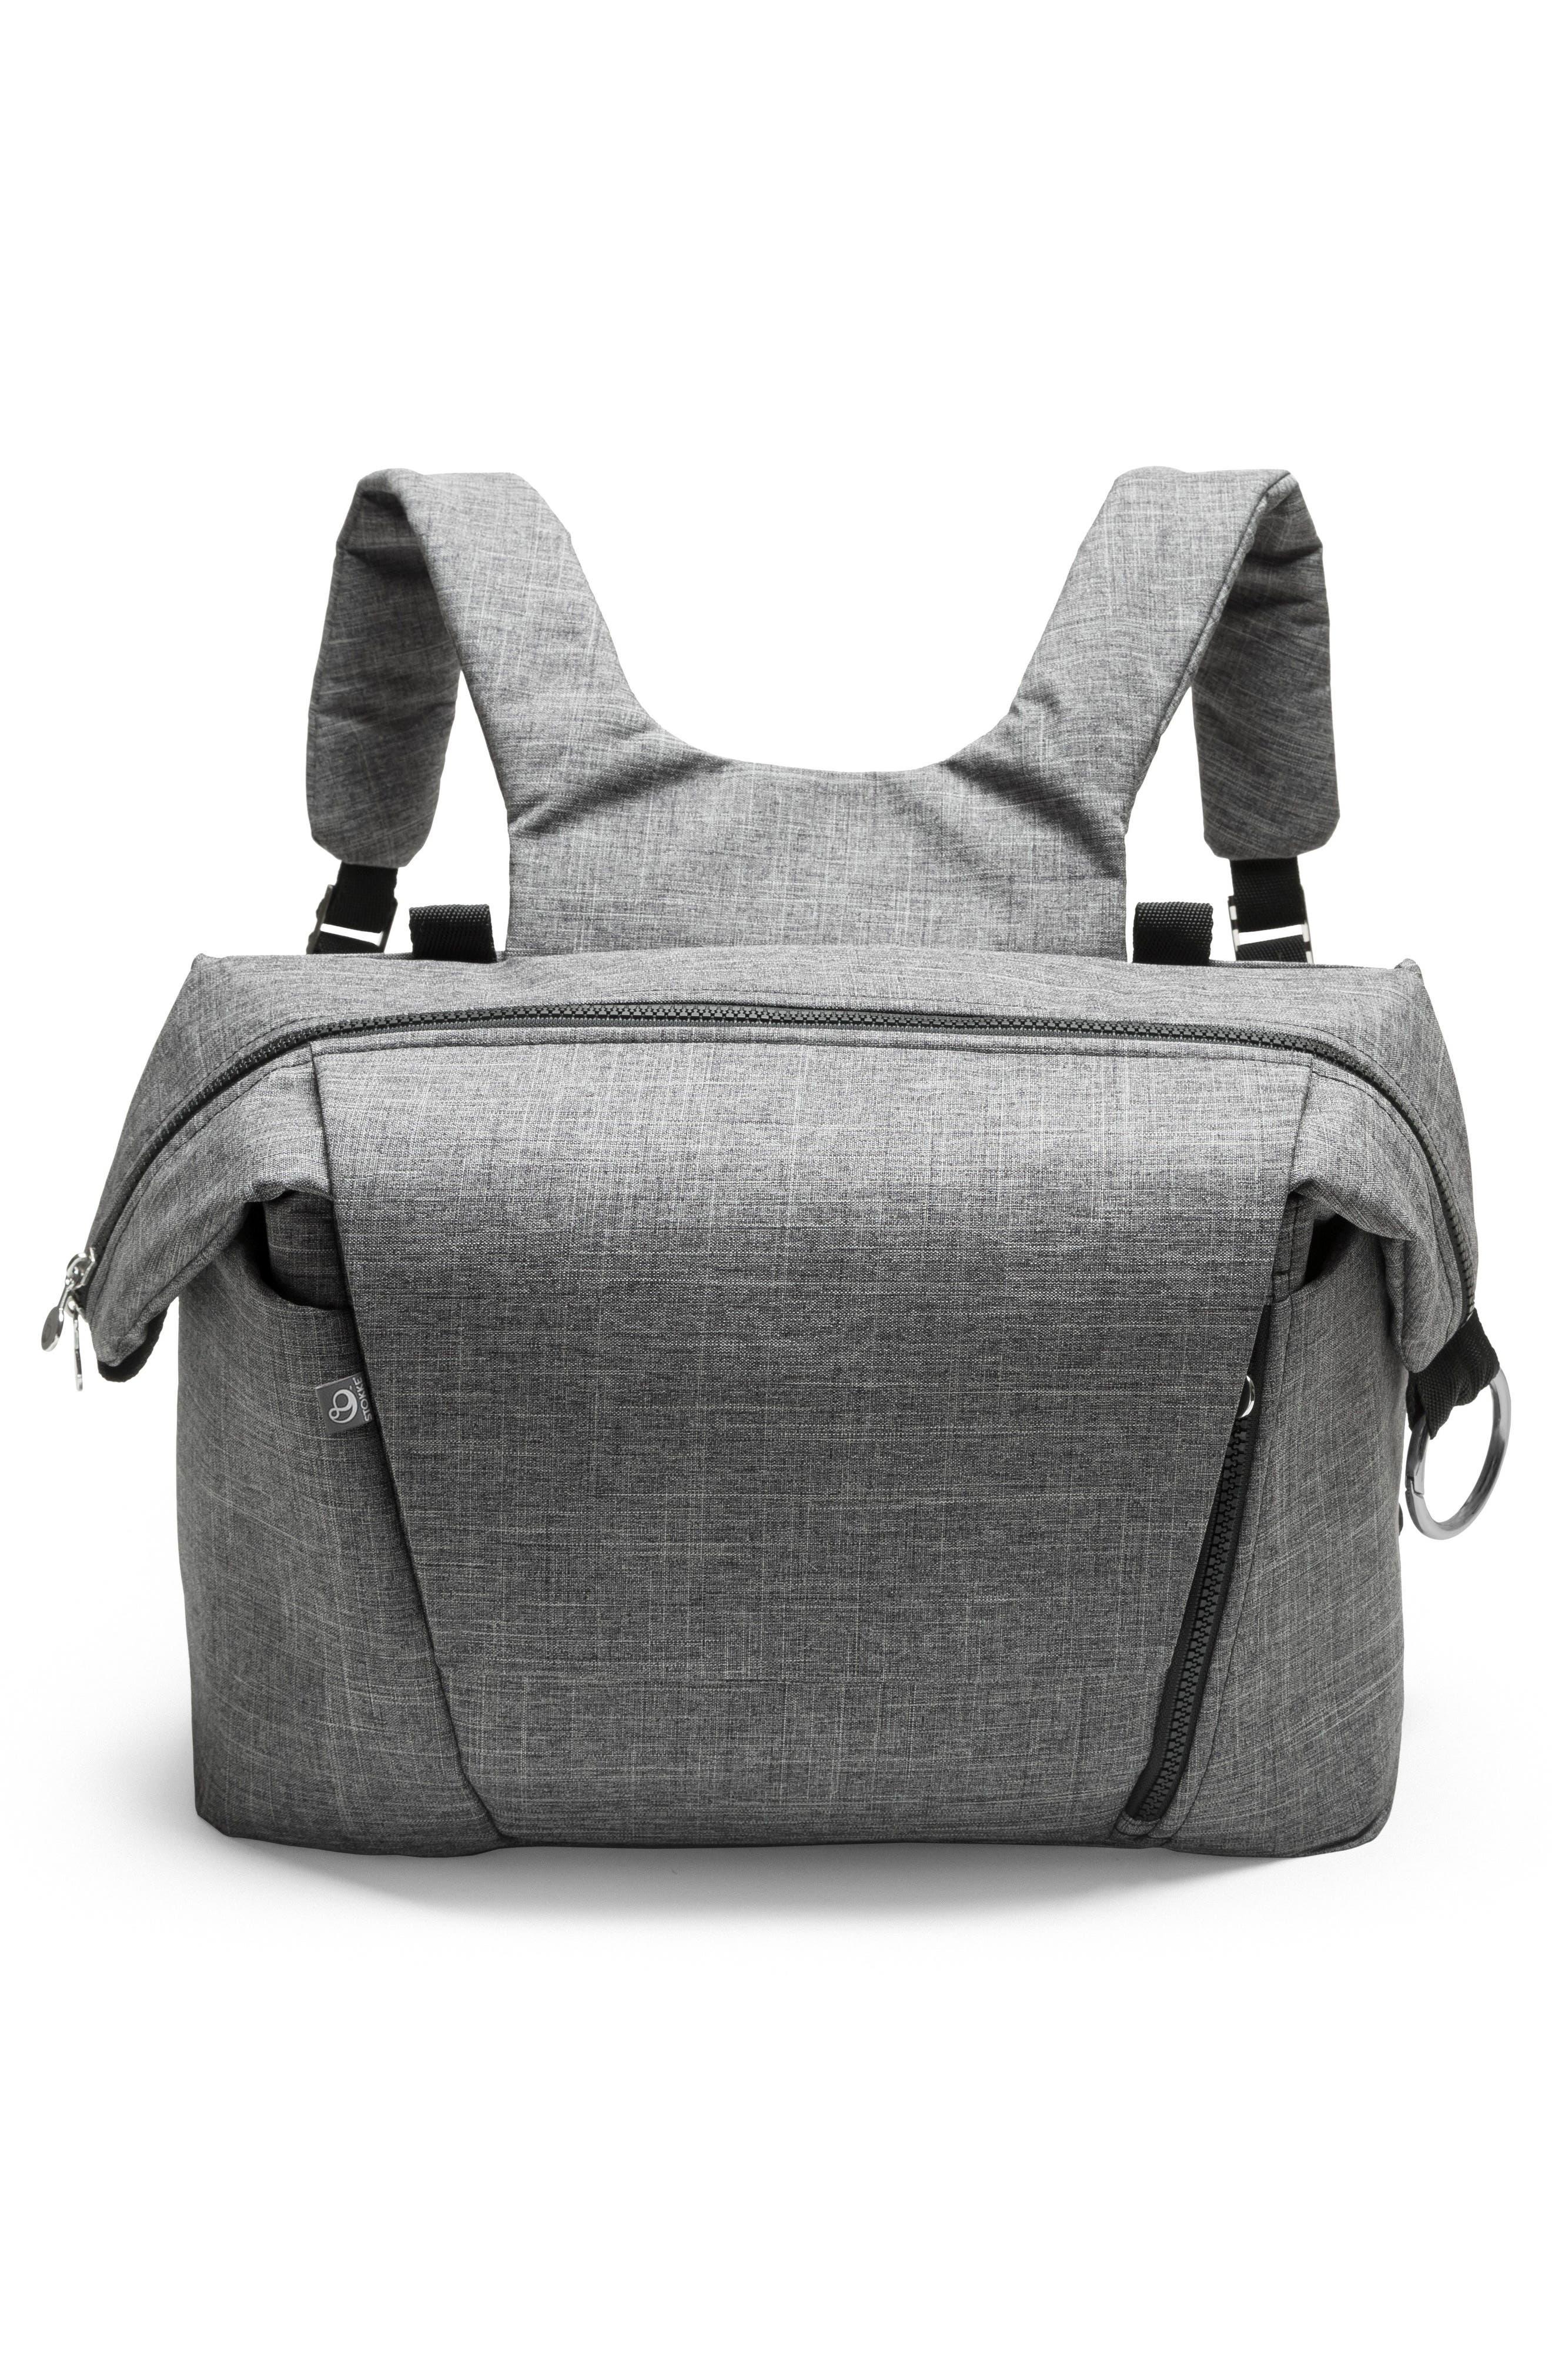 Baby 'Xplory<sup>®</sup>' Changing Bag,                             Alternate thumbnail 4, color,                             002